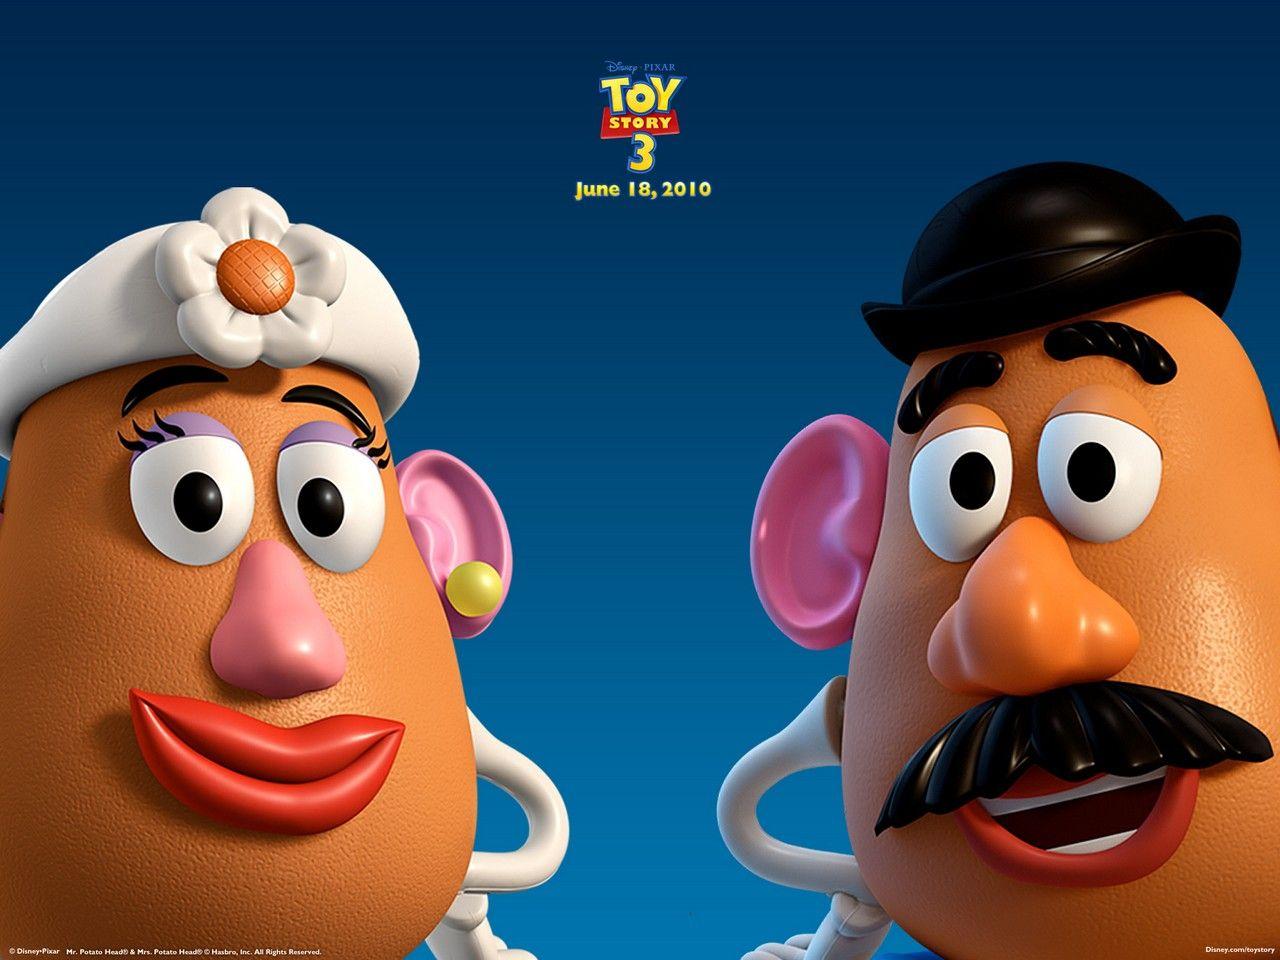 37 Fondos de Toy Story 3! Elegí tu Personaje Favorito! - Taringa ... e4db8508761